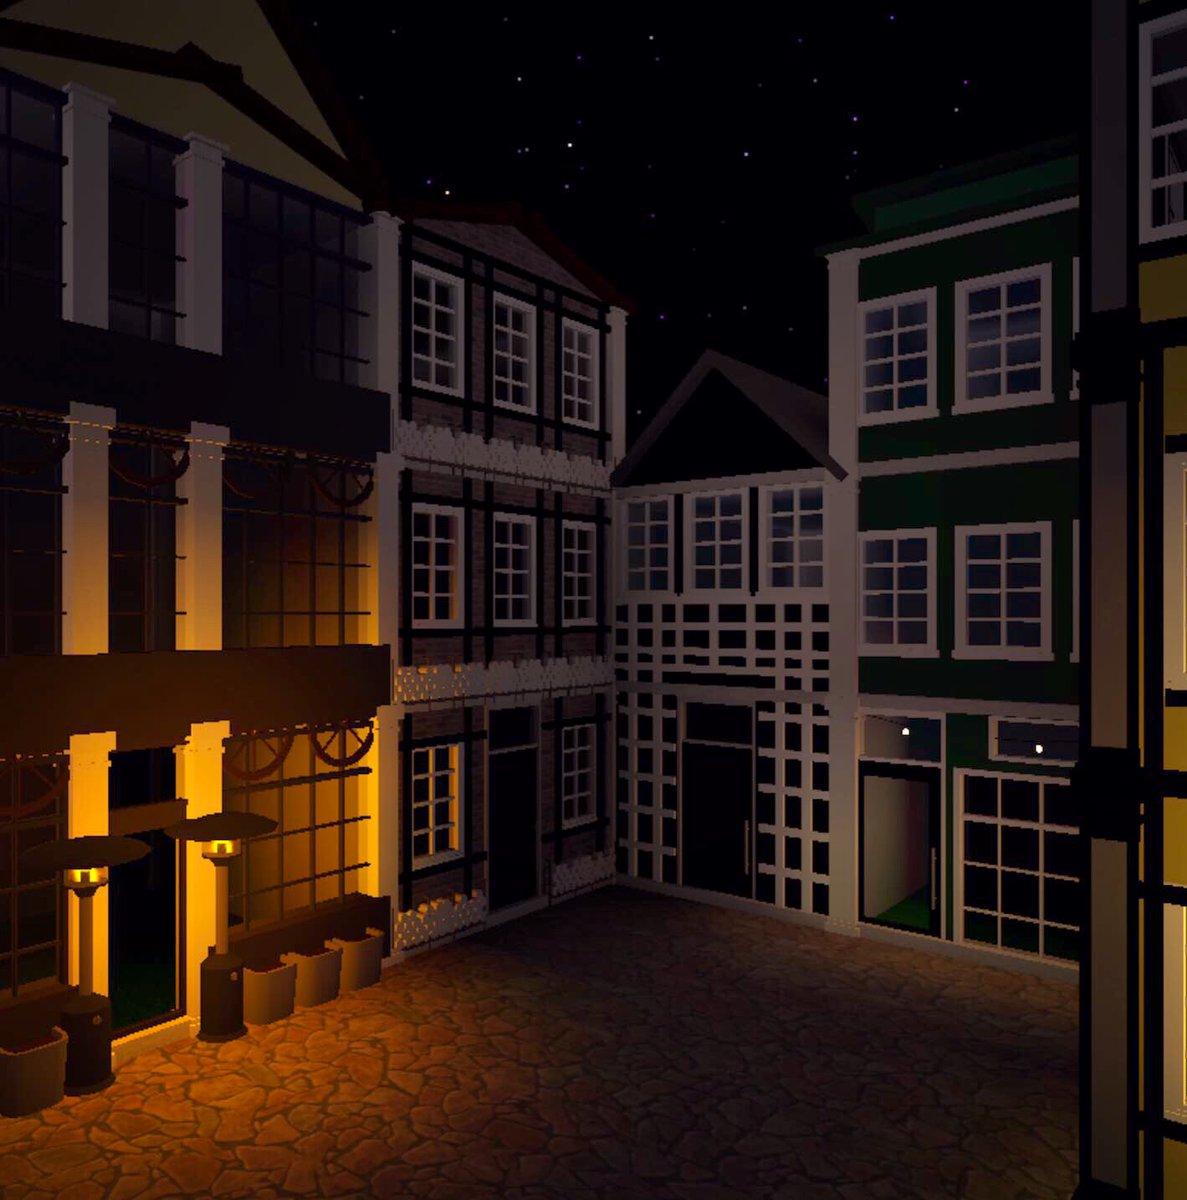 Building A Mini Town Roblox Welcome To Bloxburg 1 - Bloxburgtown Hashtag On Twitter